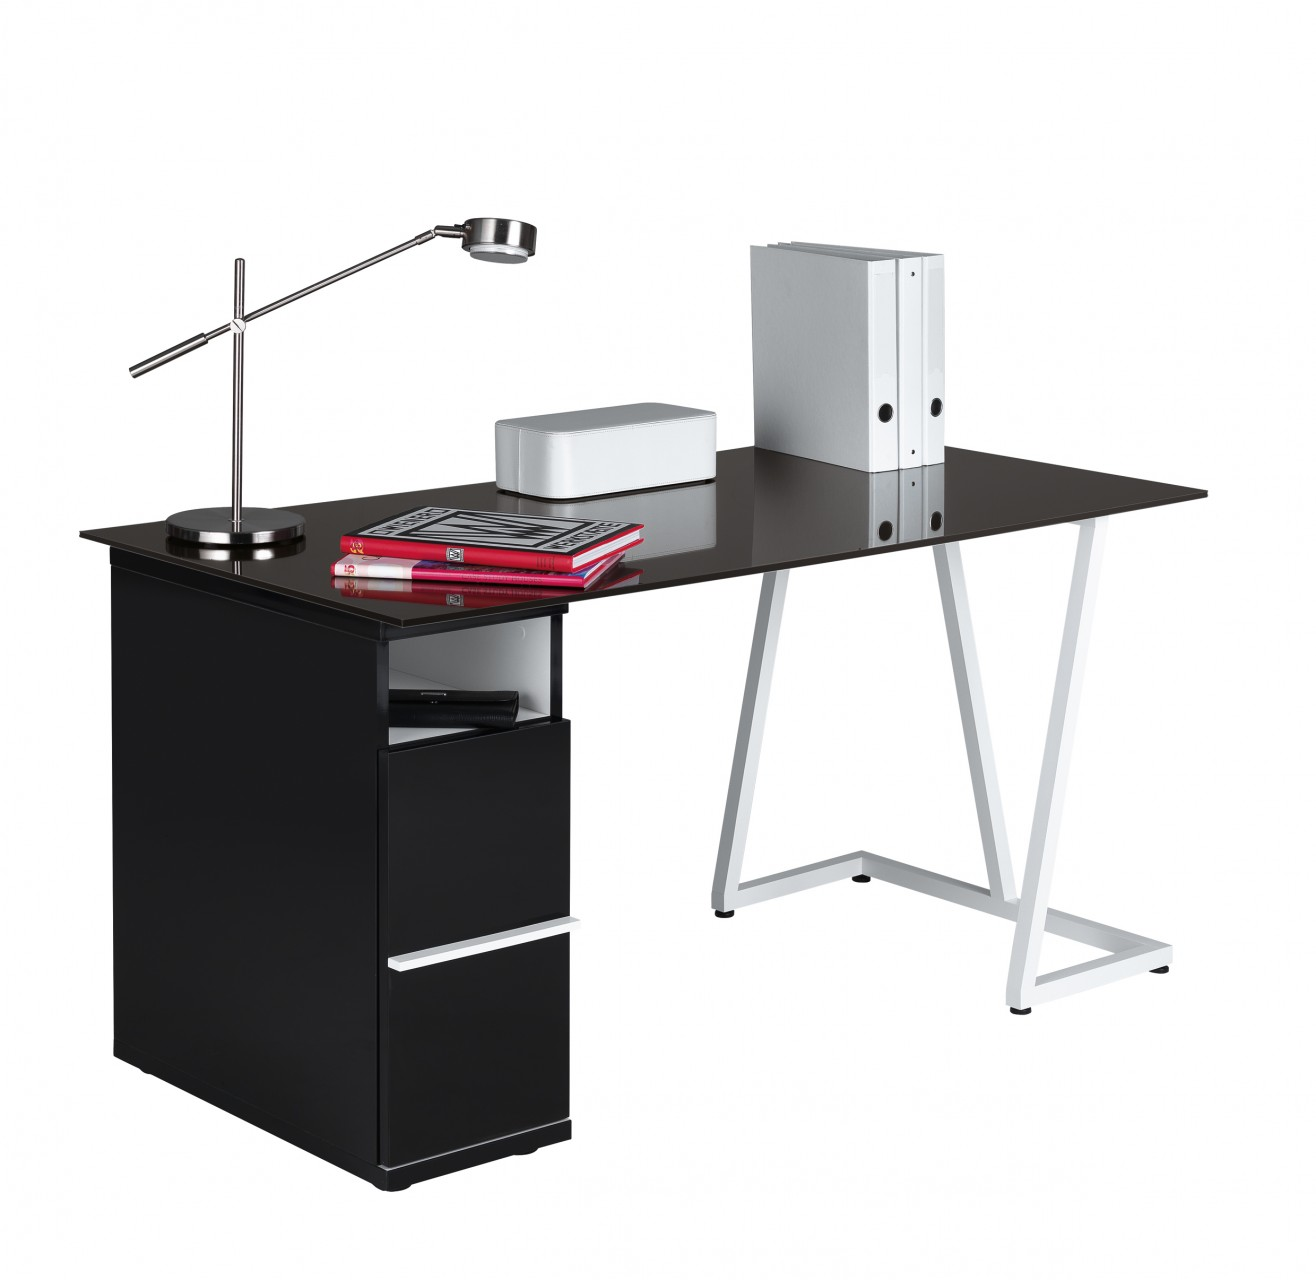 bureau caisson street achat home offices 297 00. Black Bedroom Furniture Sets. Home Design Ideas